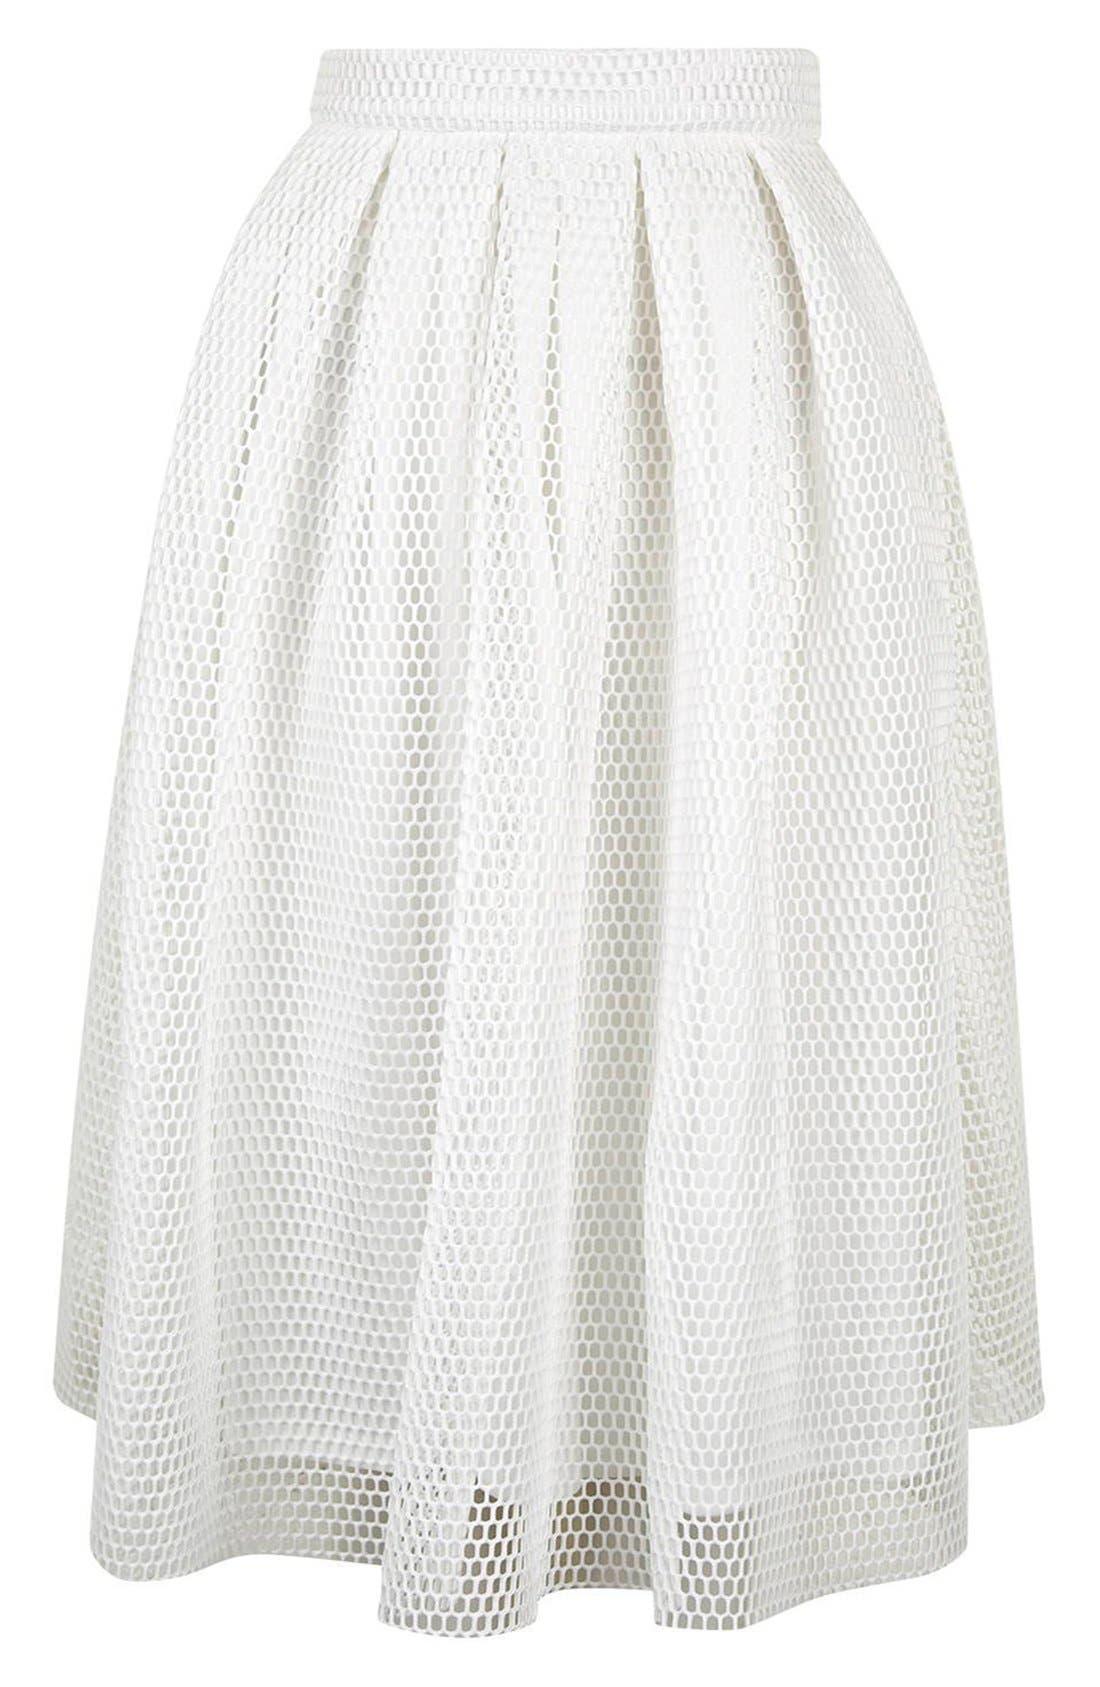 TOPSHOP, Airtex Pleat Midi Skirt, Alternate thumbnail 2, color, 100